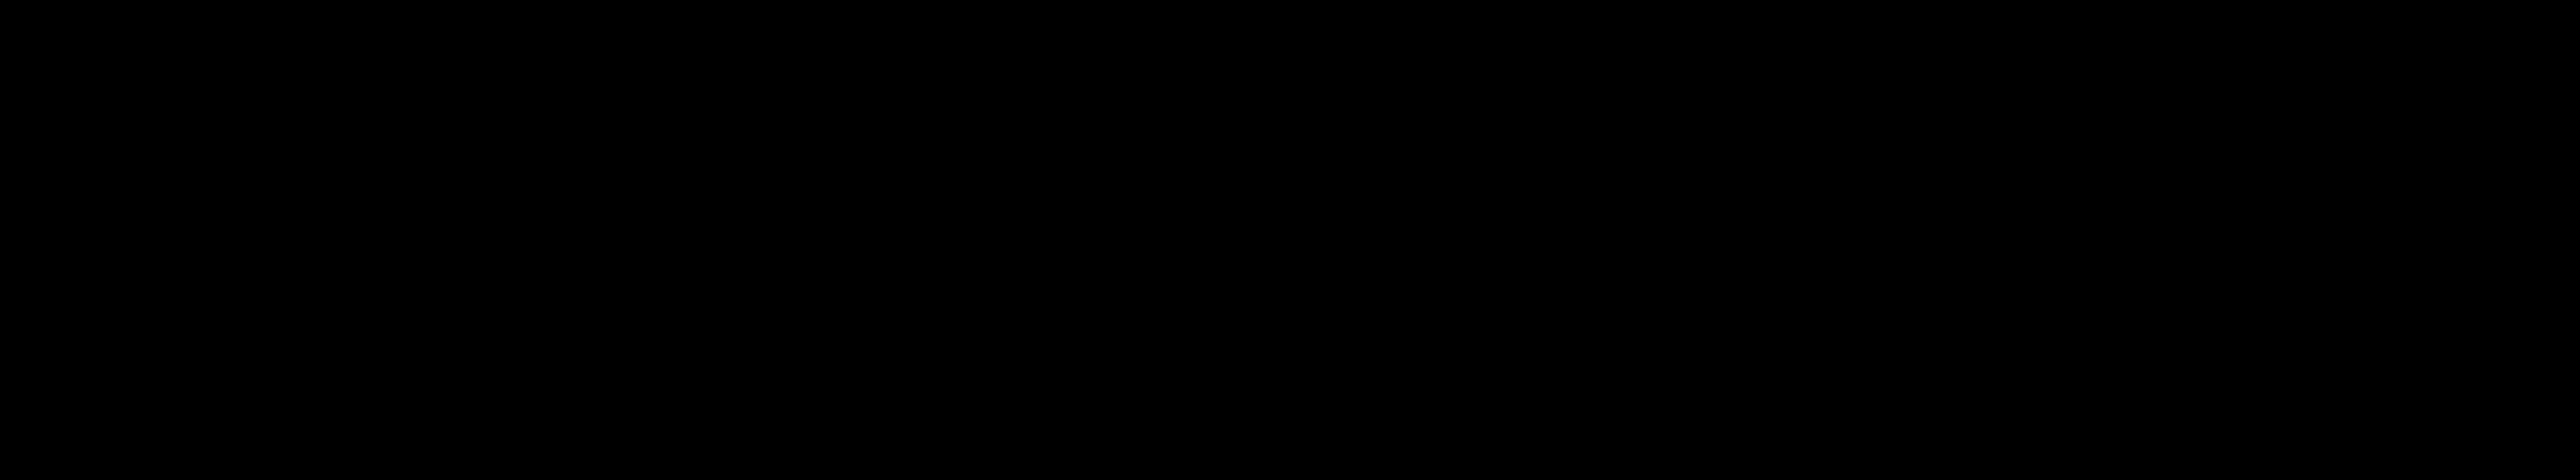 102782-98-9